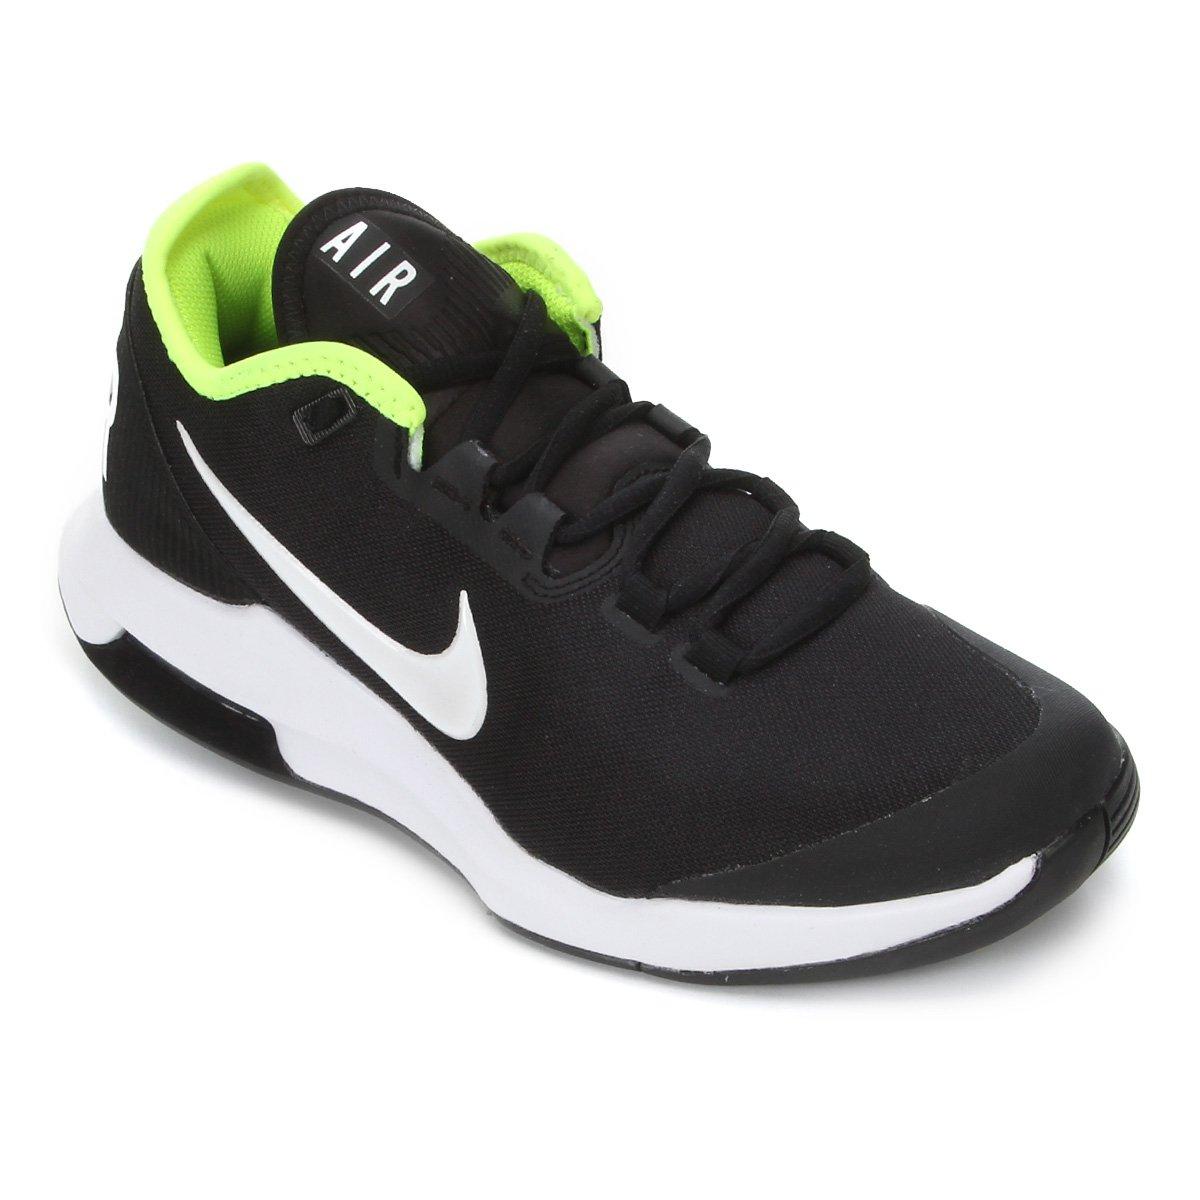 Tenis Nike AIR Zoom Zero